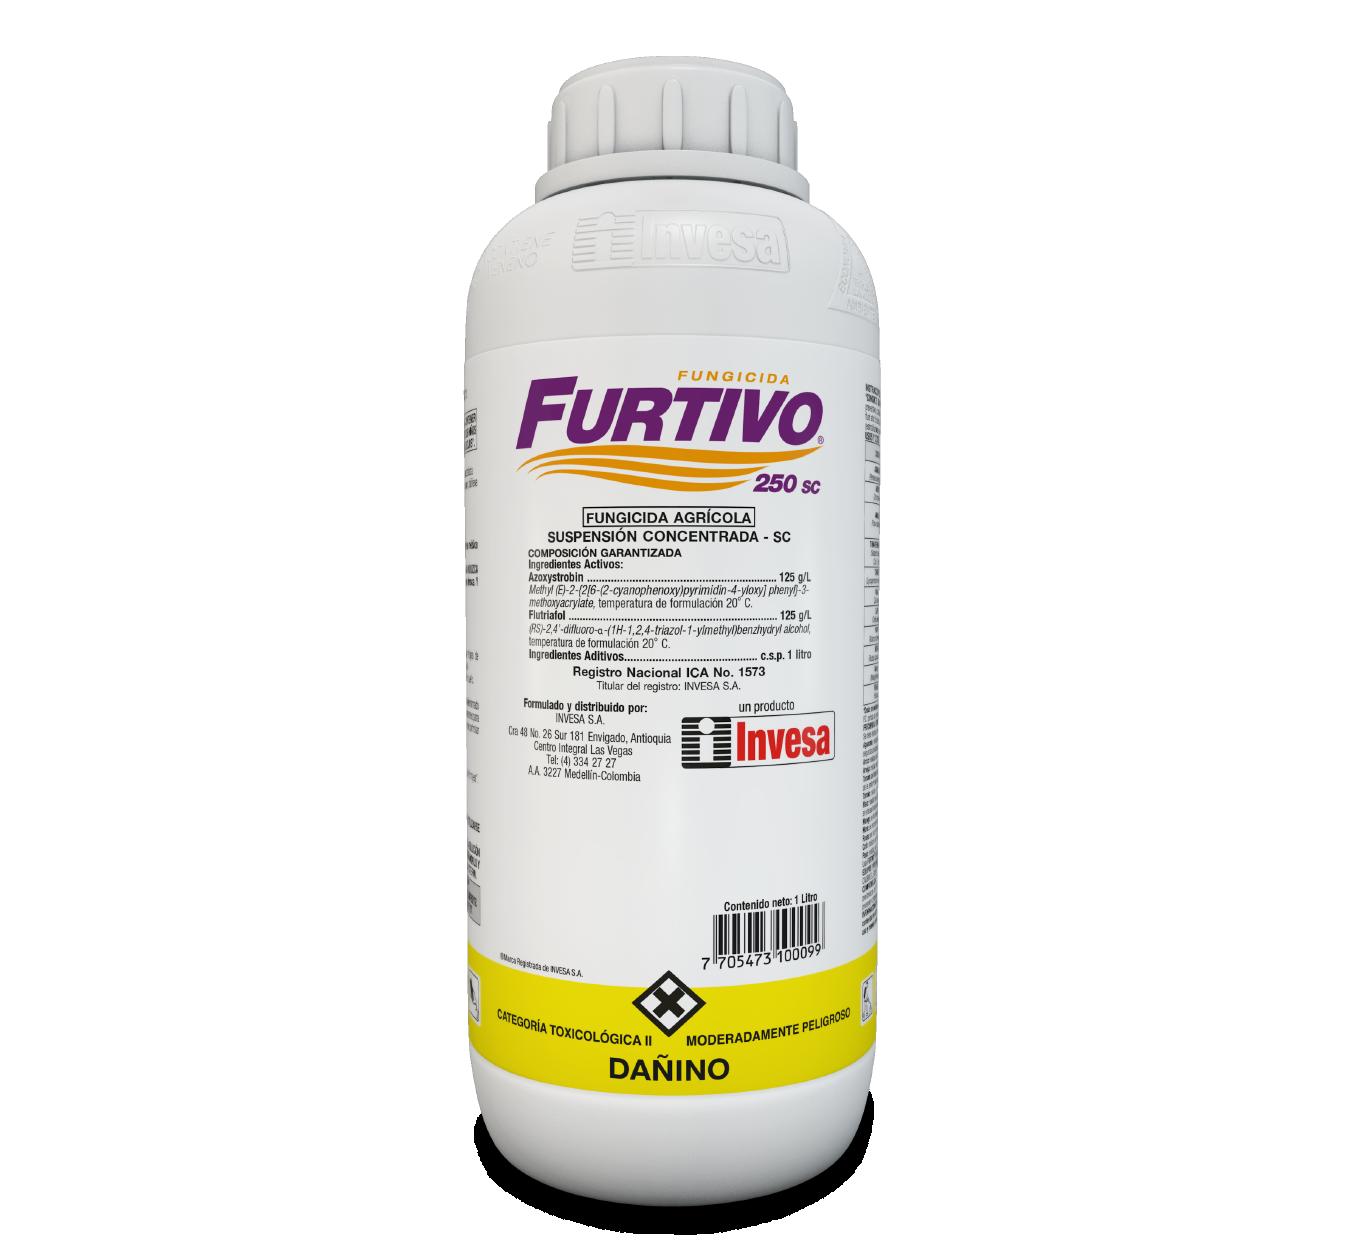 Fungicida furtivo 250 sc invesa 1 litros